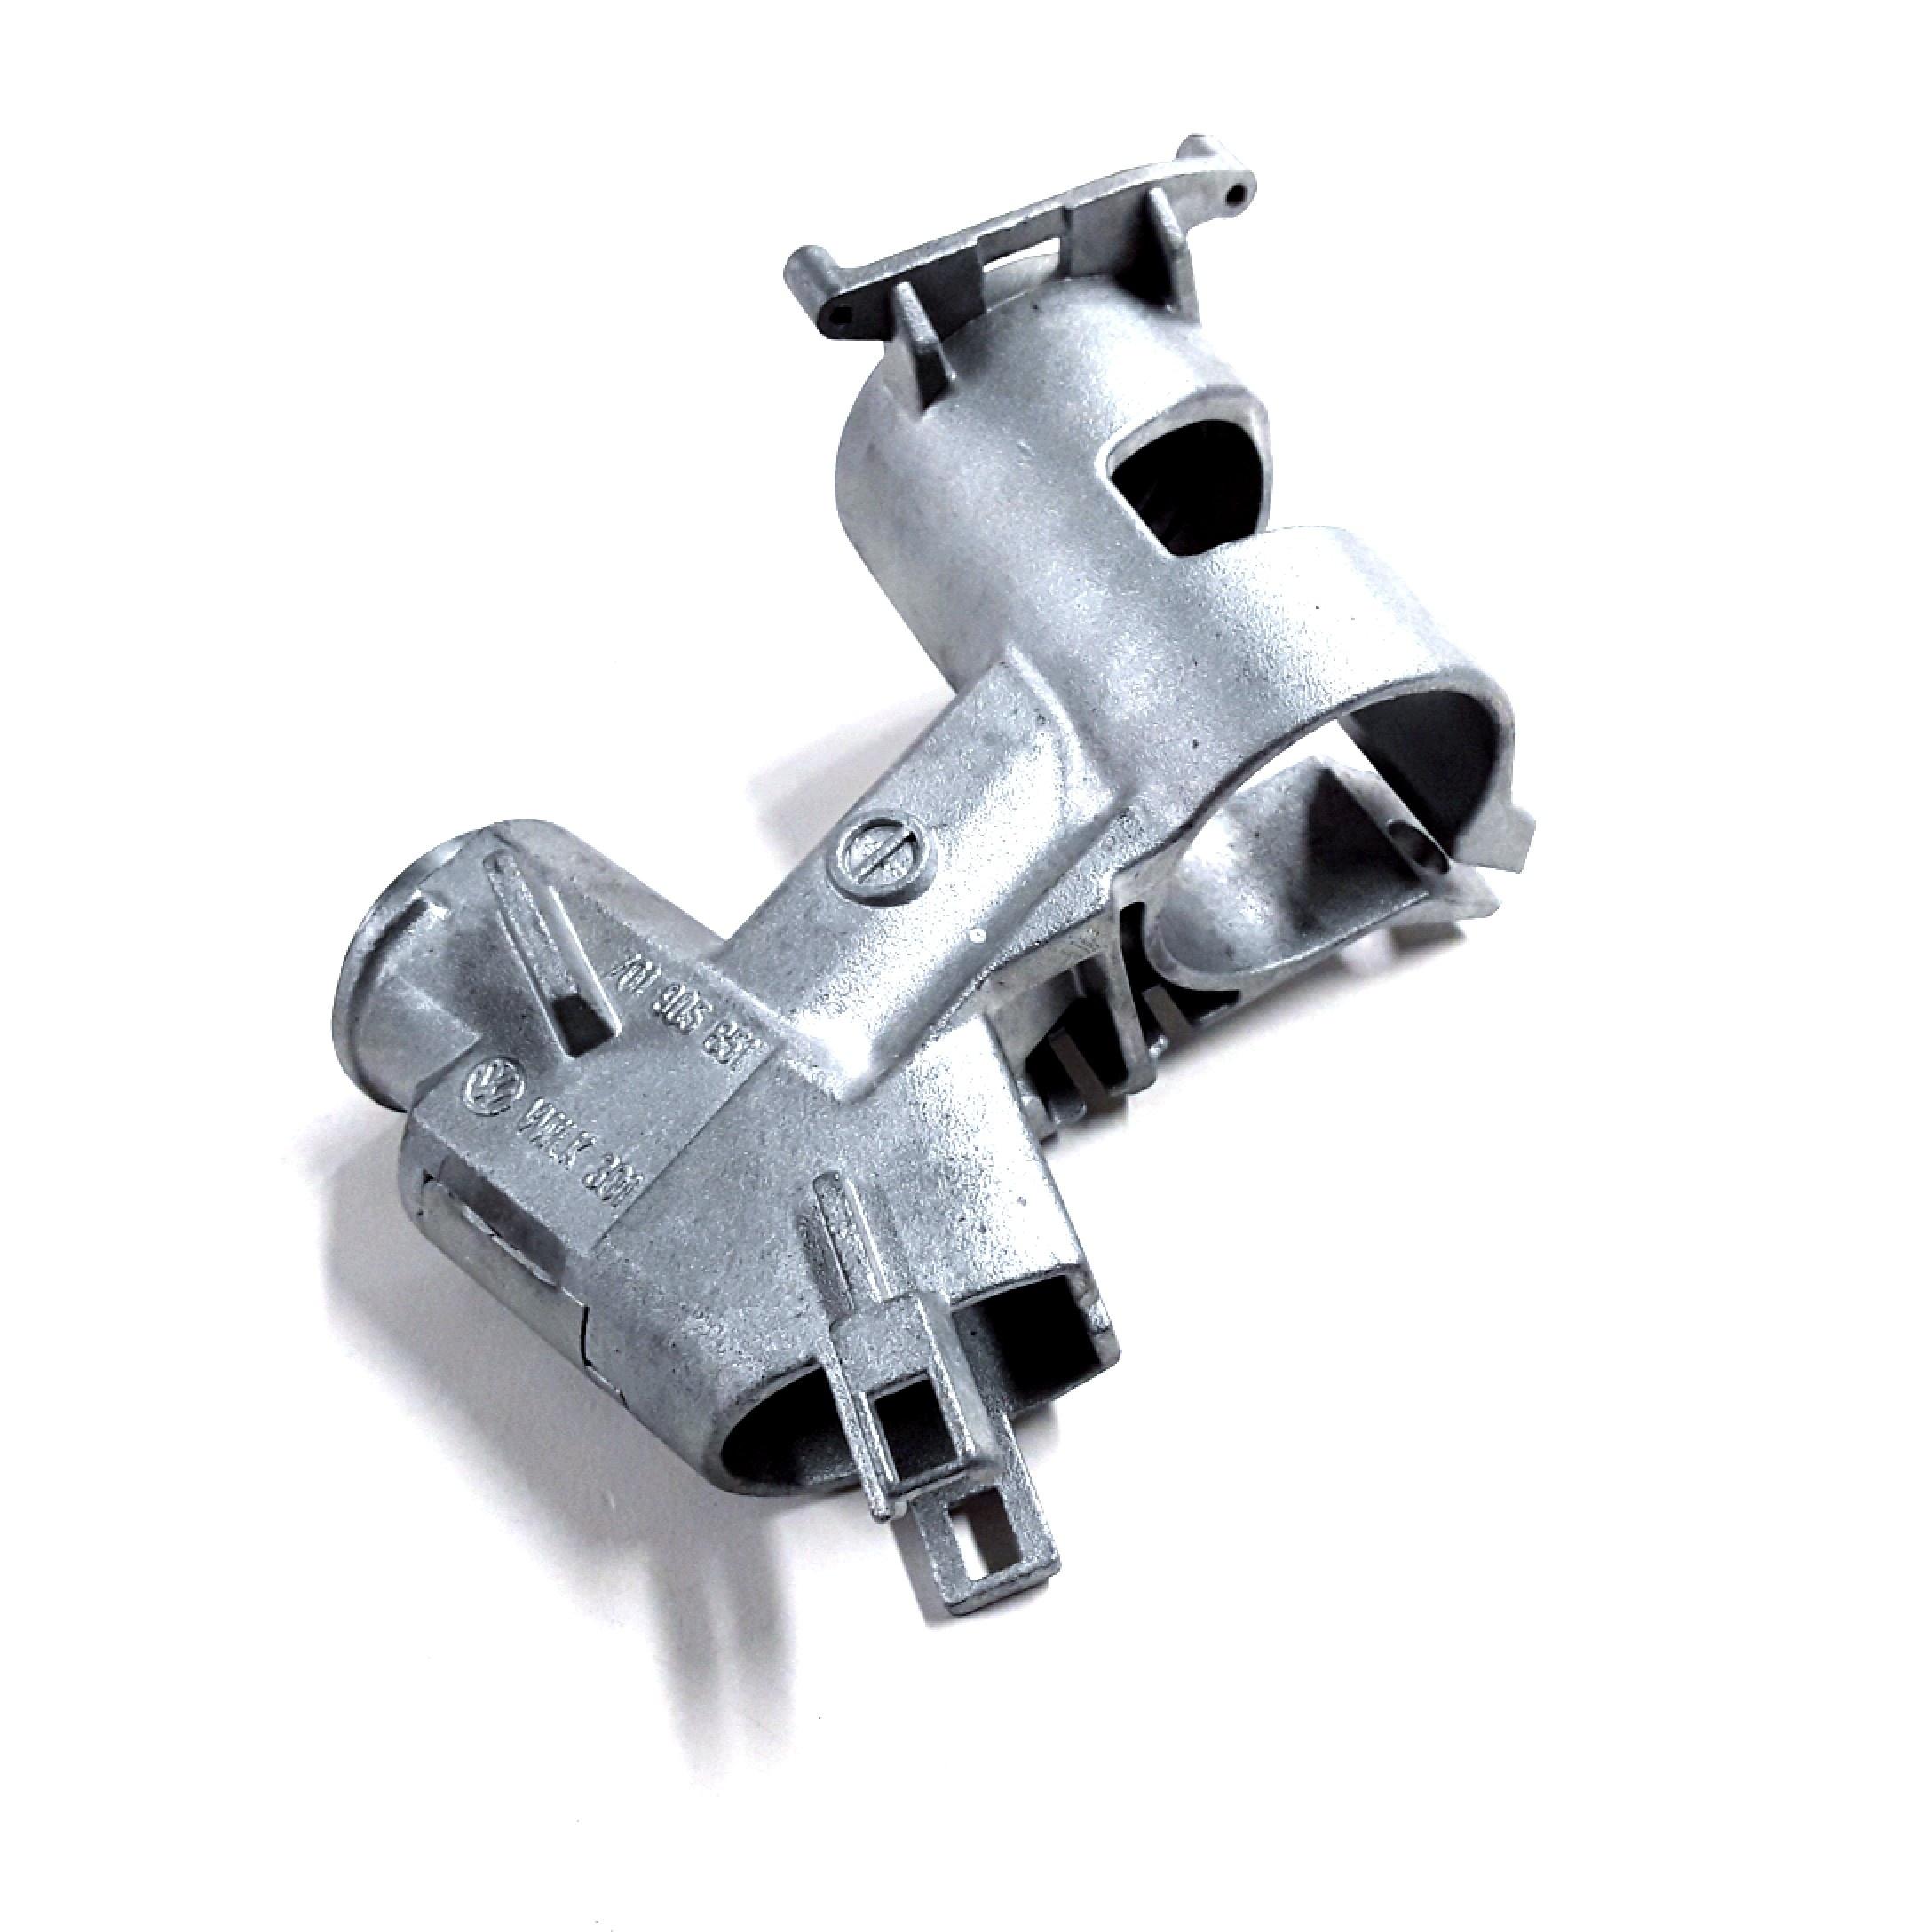 1999 Volkswagen Eurovan Ignition Switch  Lock Mechanism